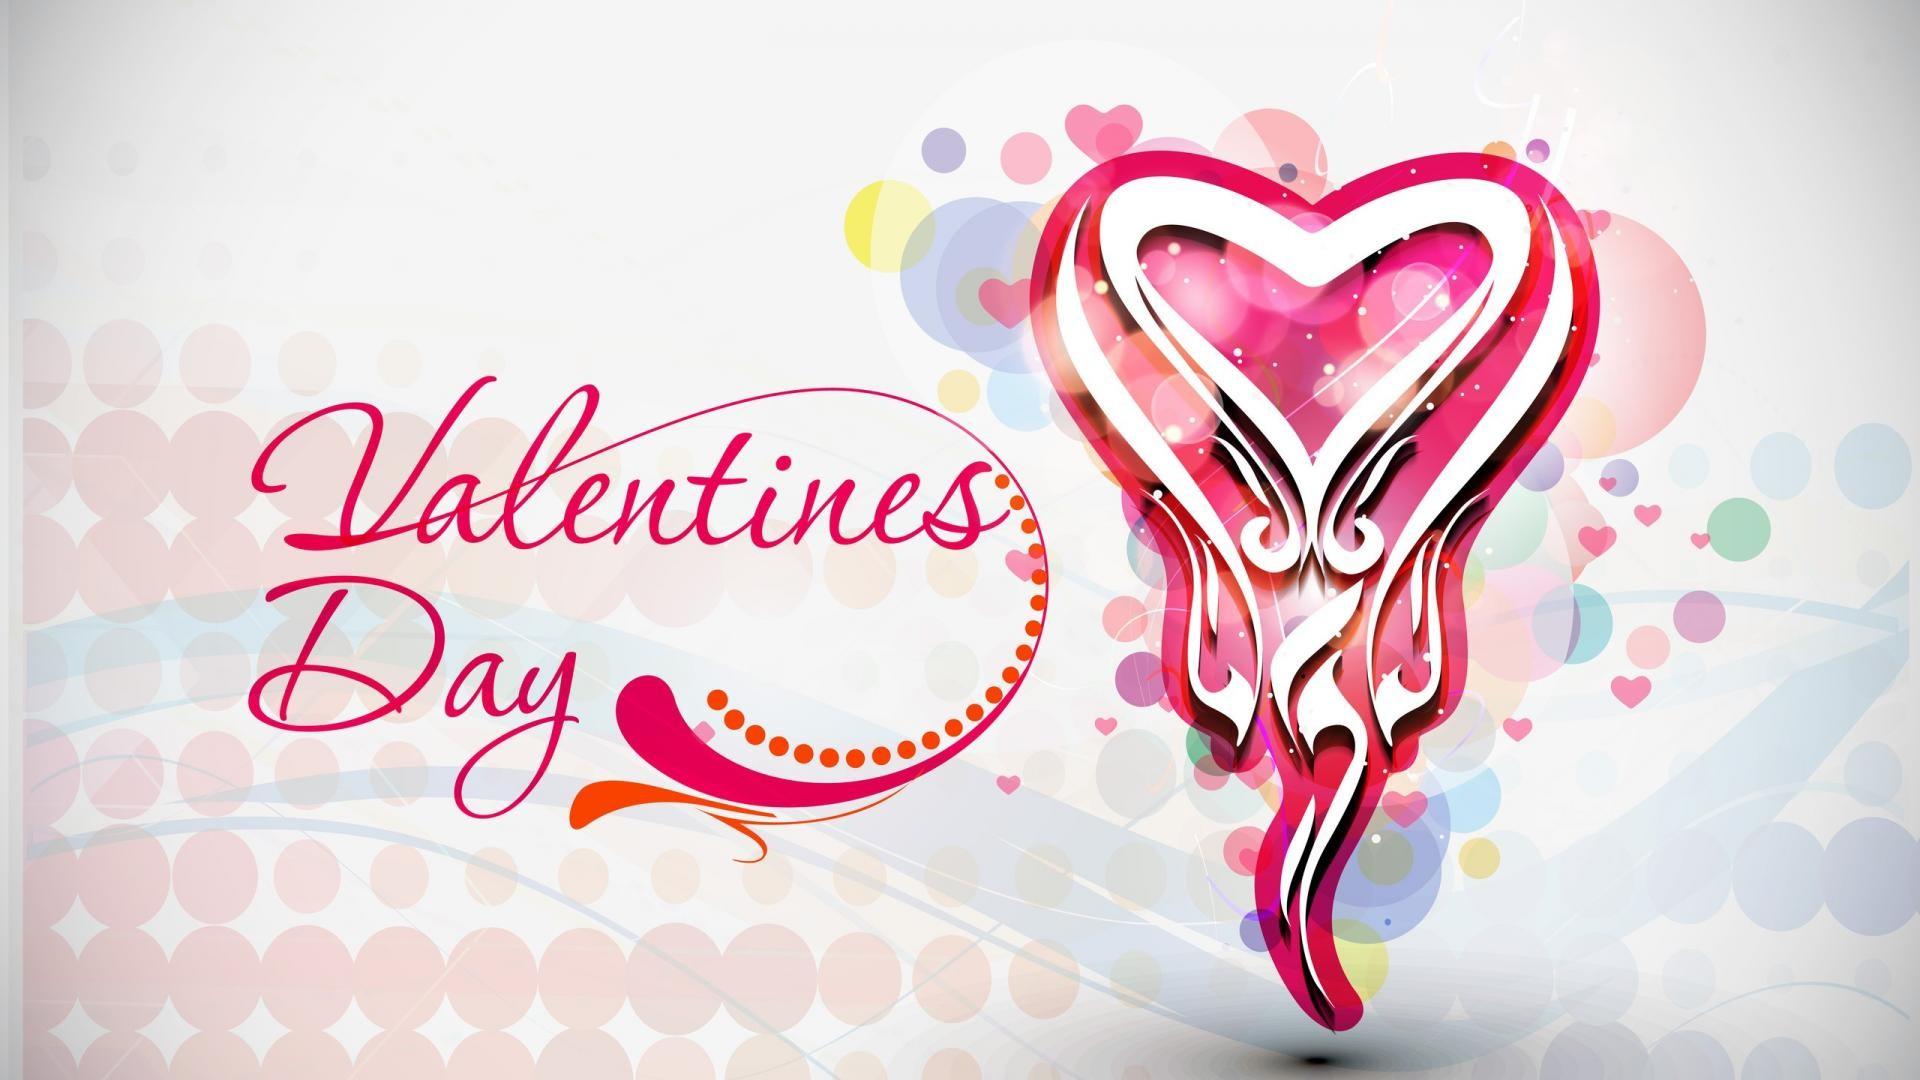 download valentines free wallpaper which is under the valentines .